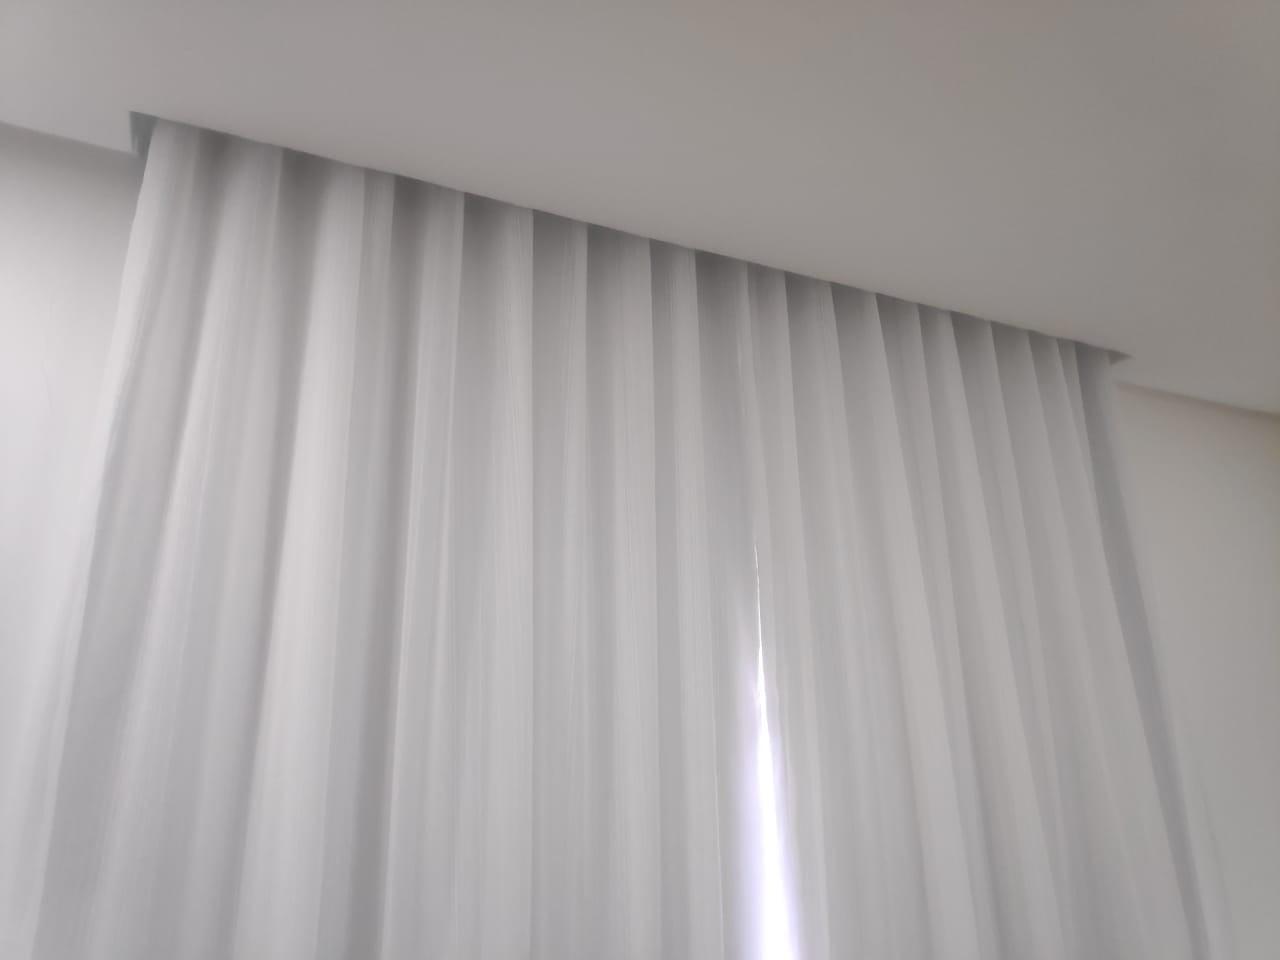 Cortina Voil Liso Branco Blackout 100% 5,40 x 3,00 Para Varão Suiço Max Simples ( Cliente Kenia ML)